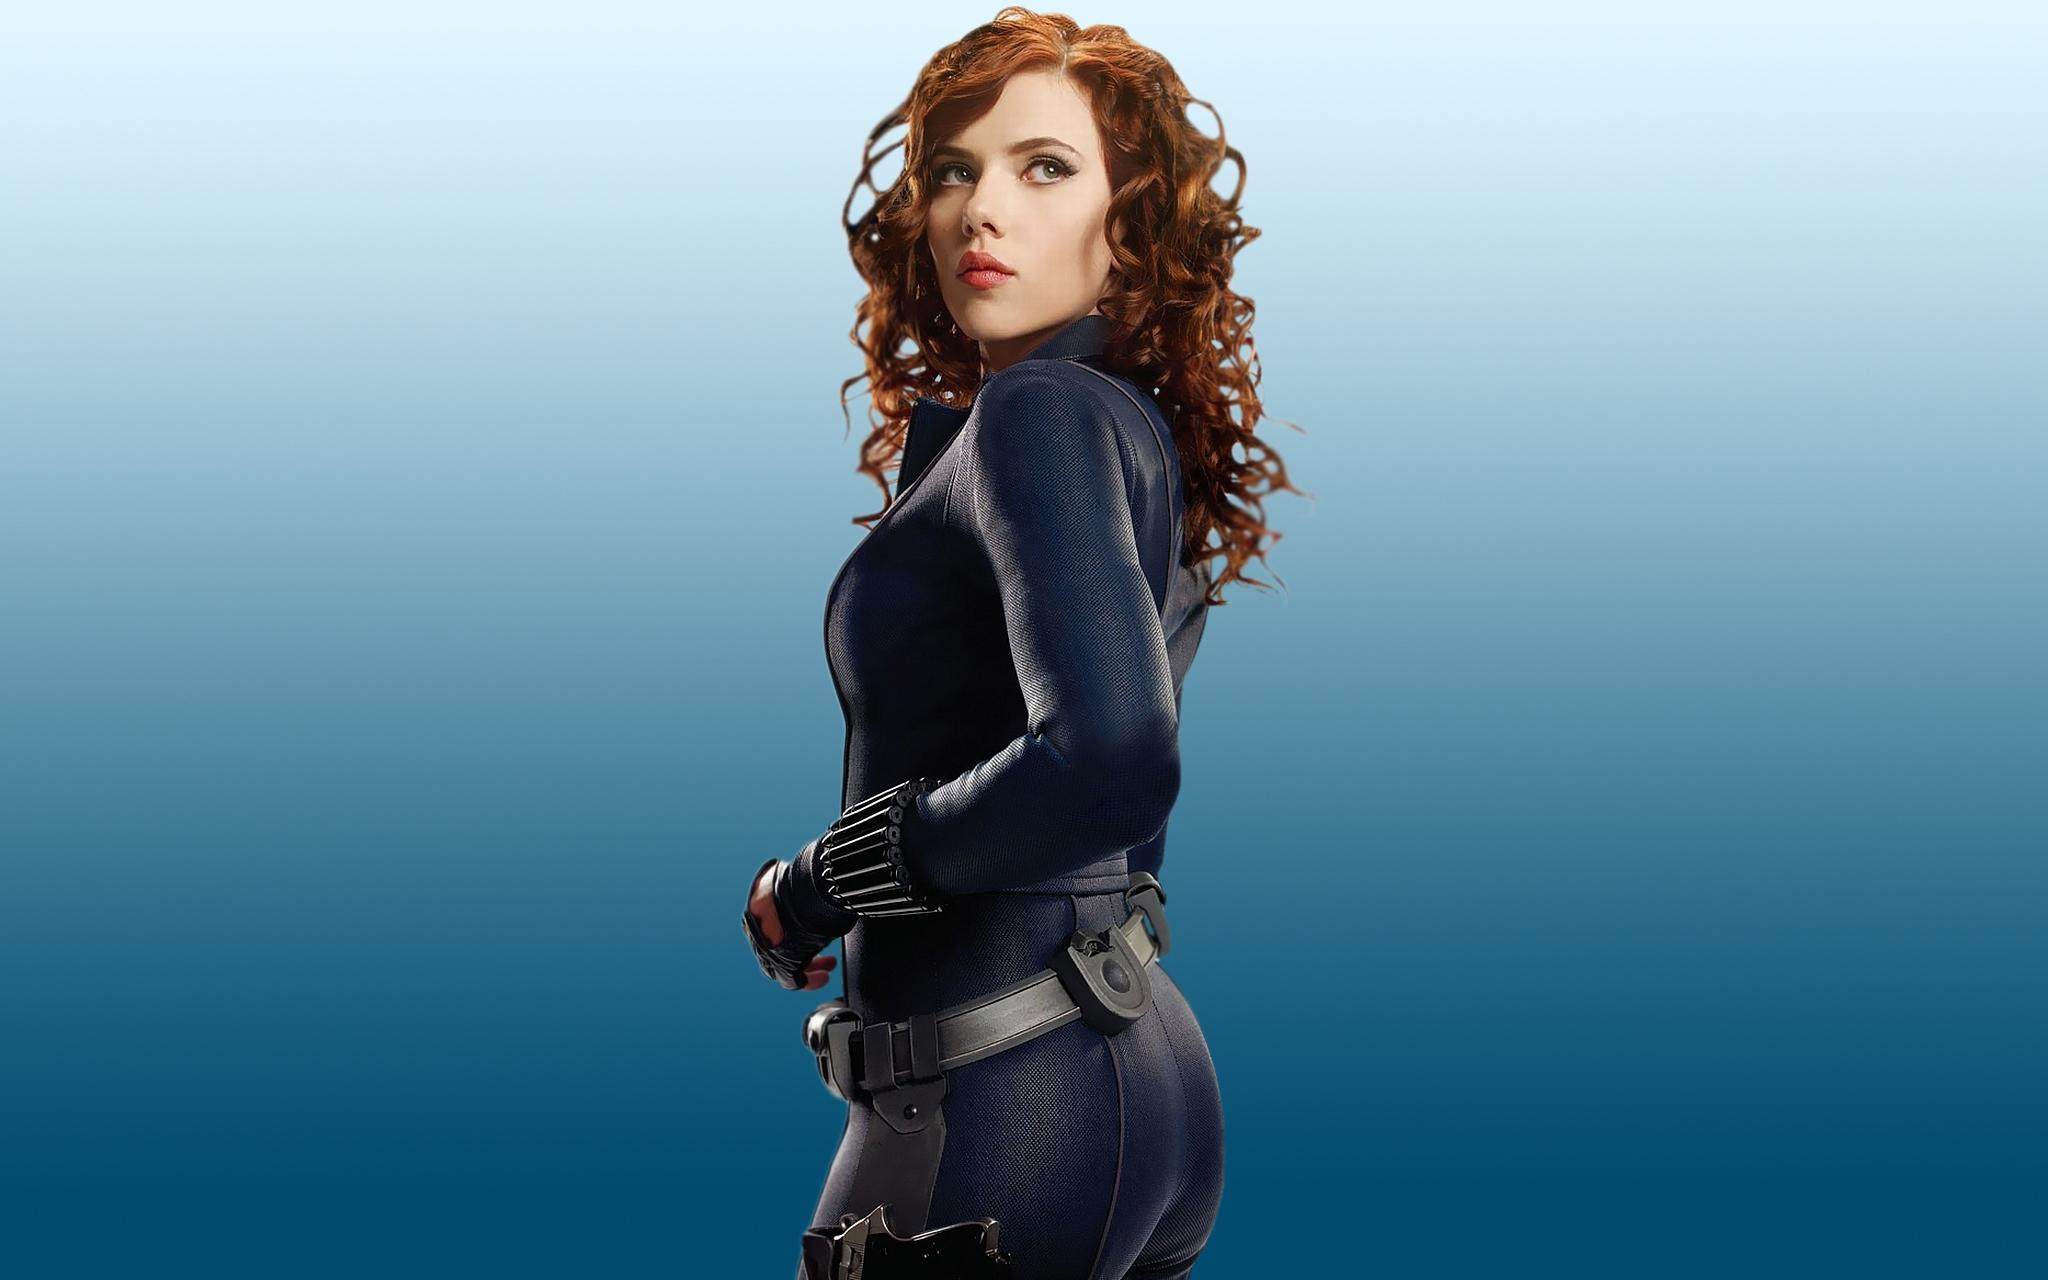 Scarlett Johansson Painting Wallpaper